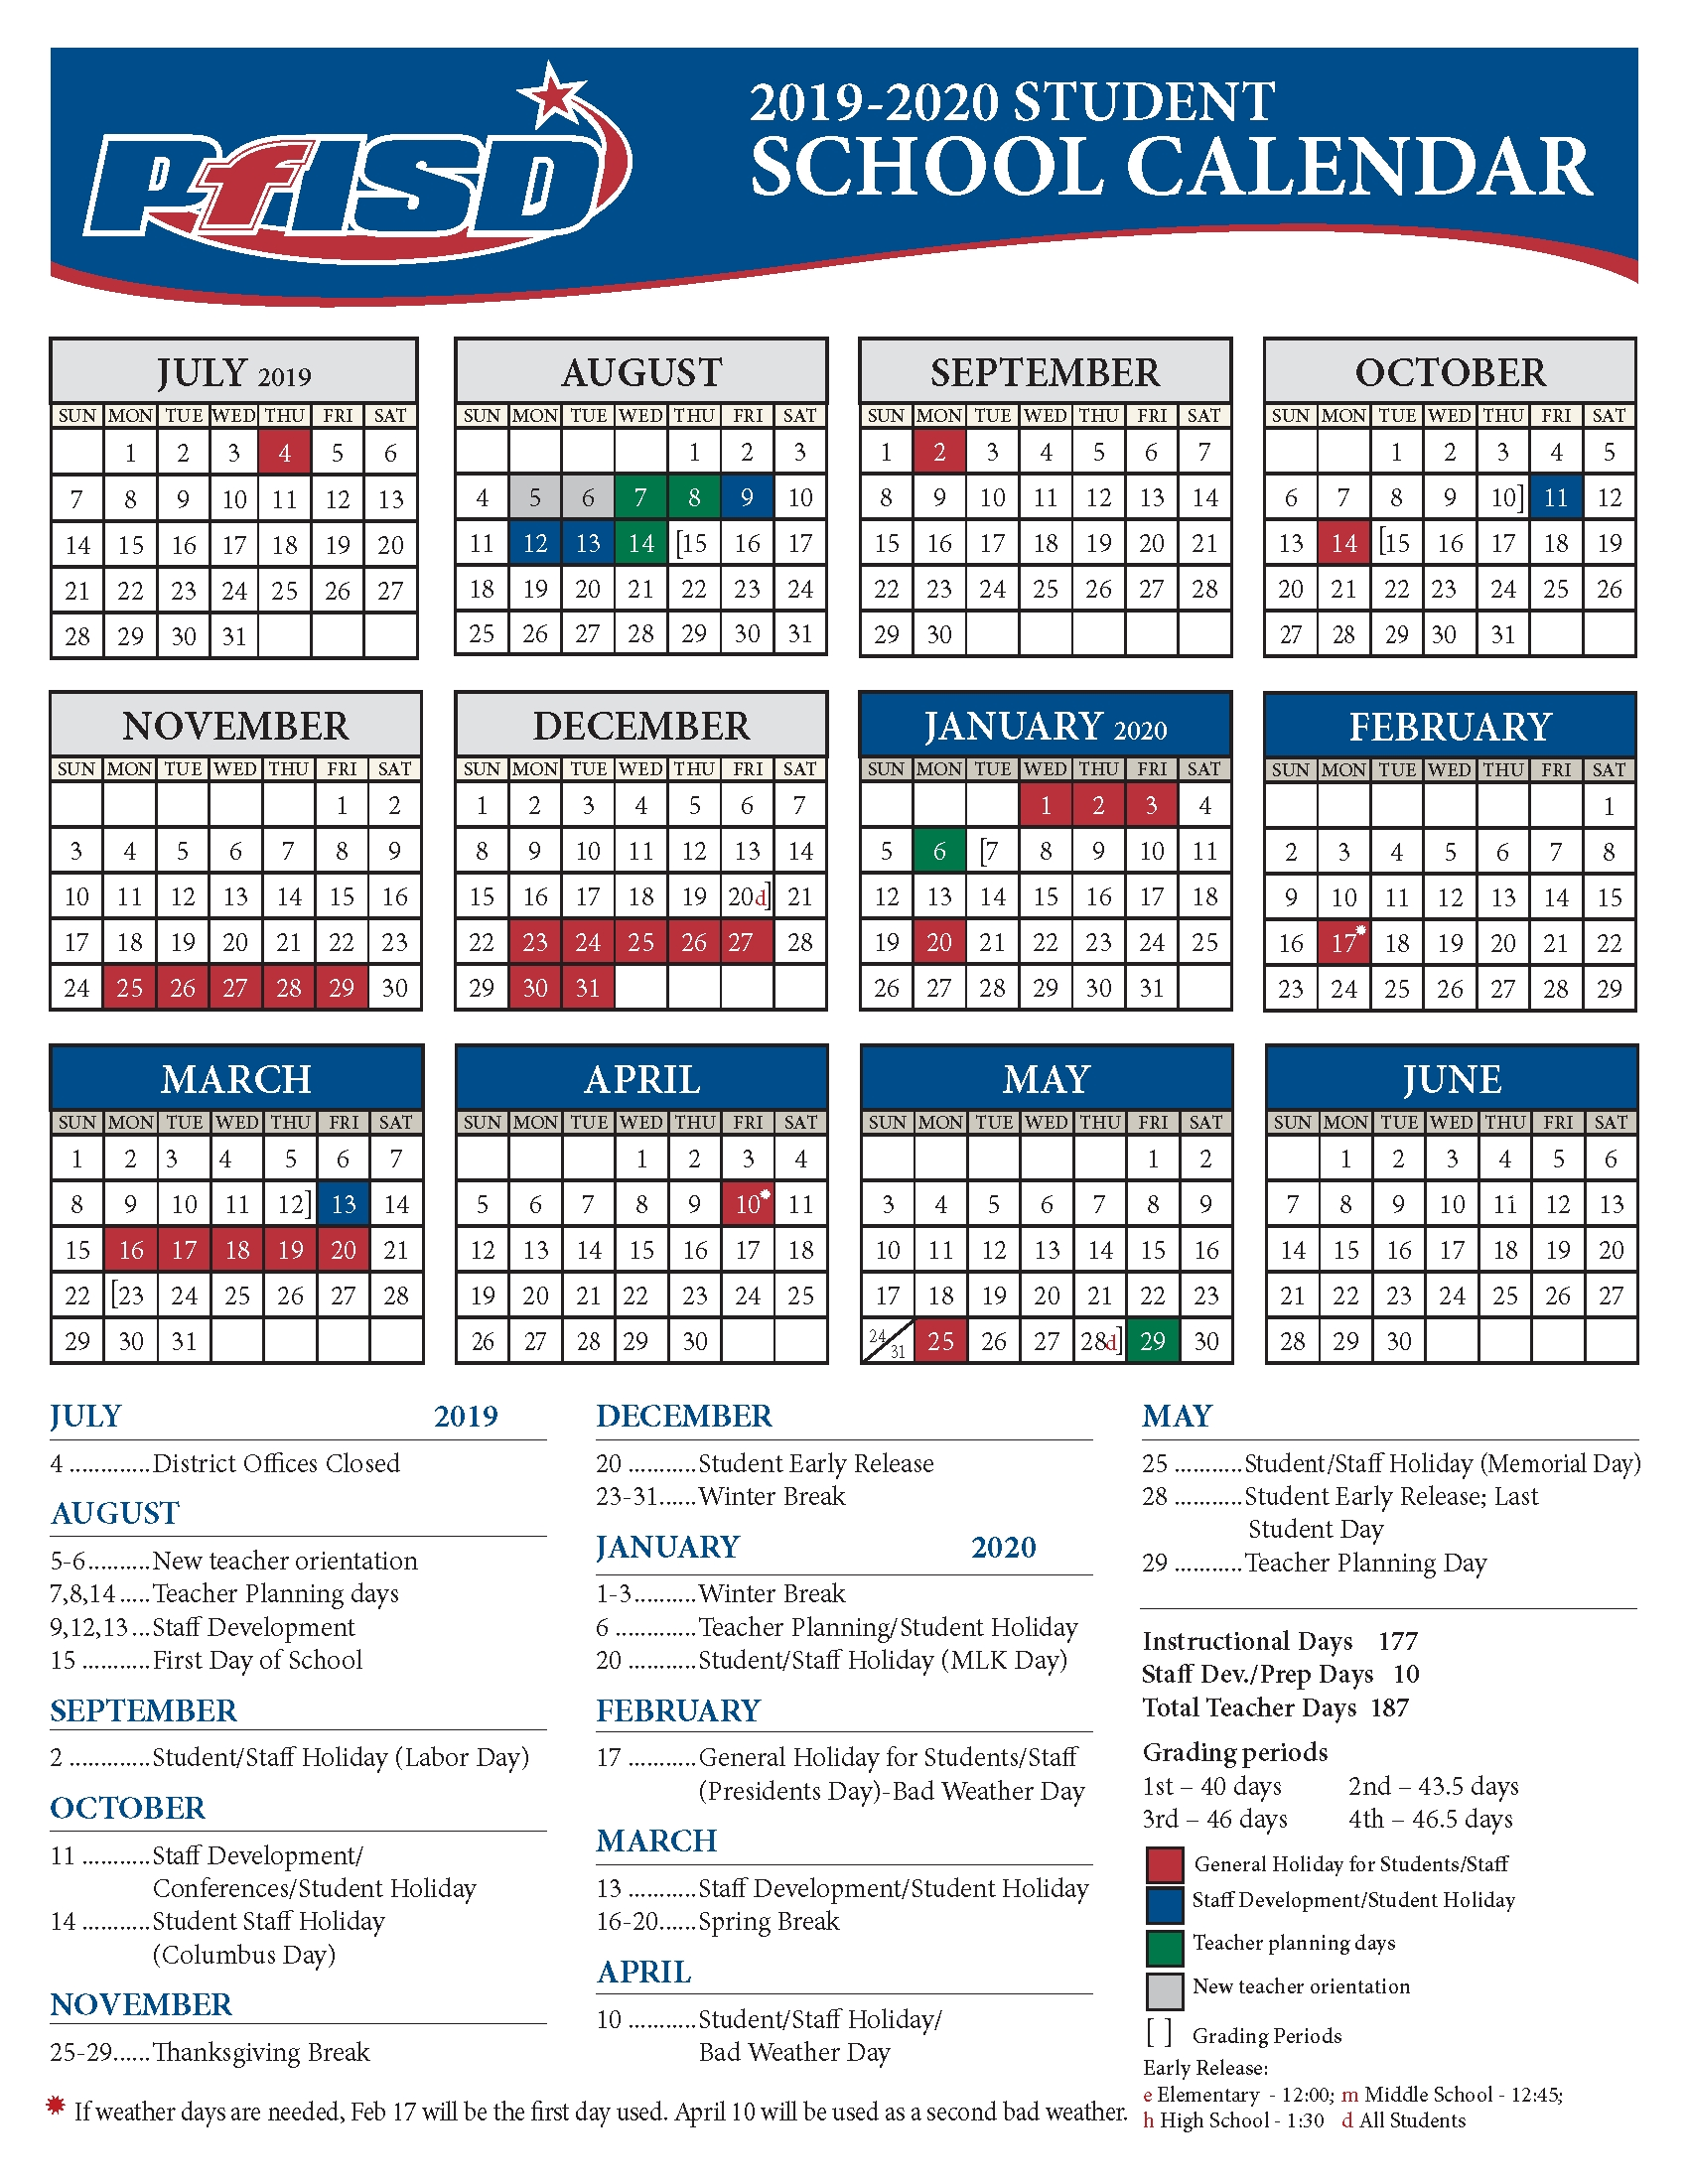 School Year Calendar / 2019-2020 District Calendar Perky Calendar For School Year